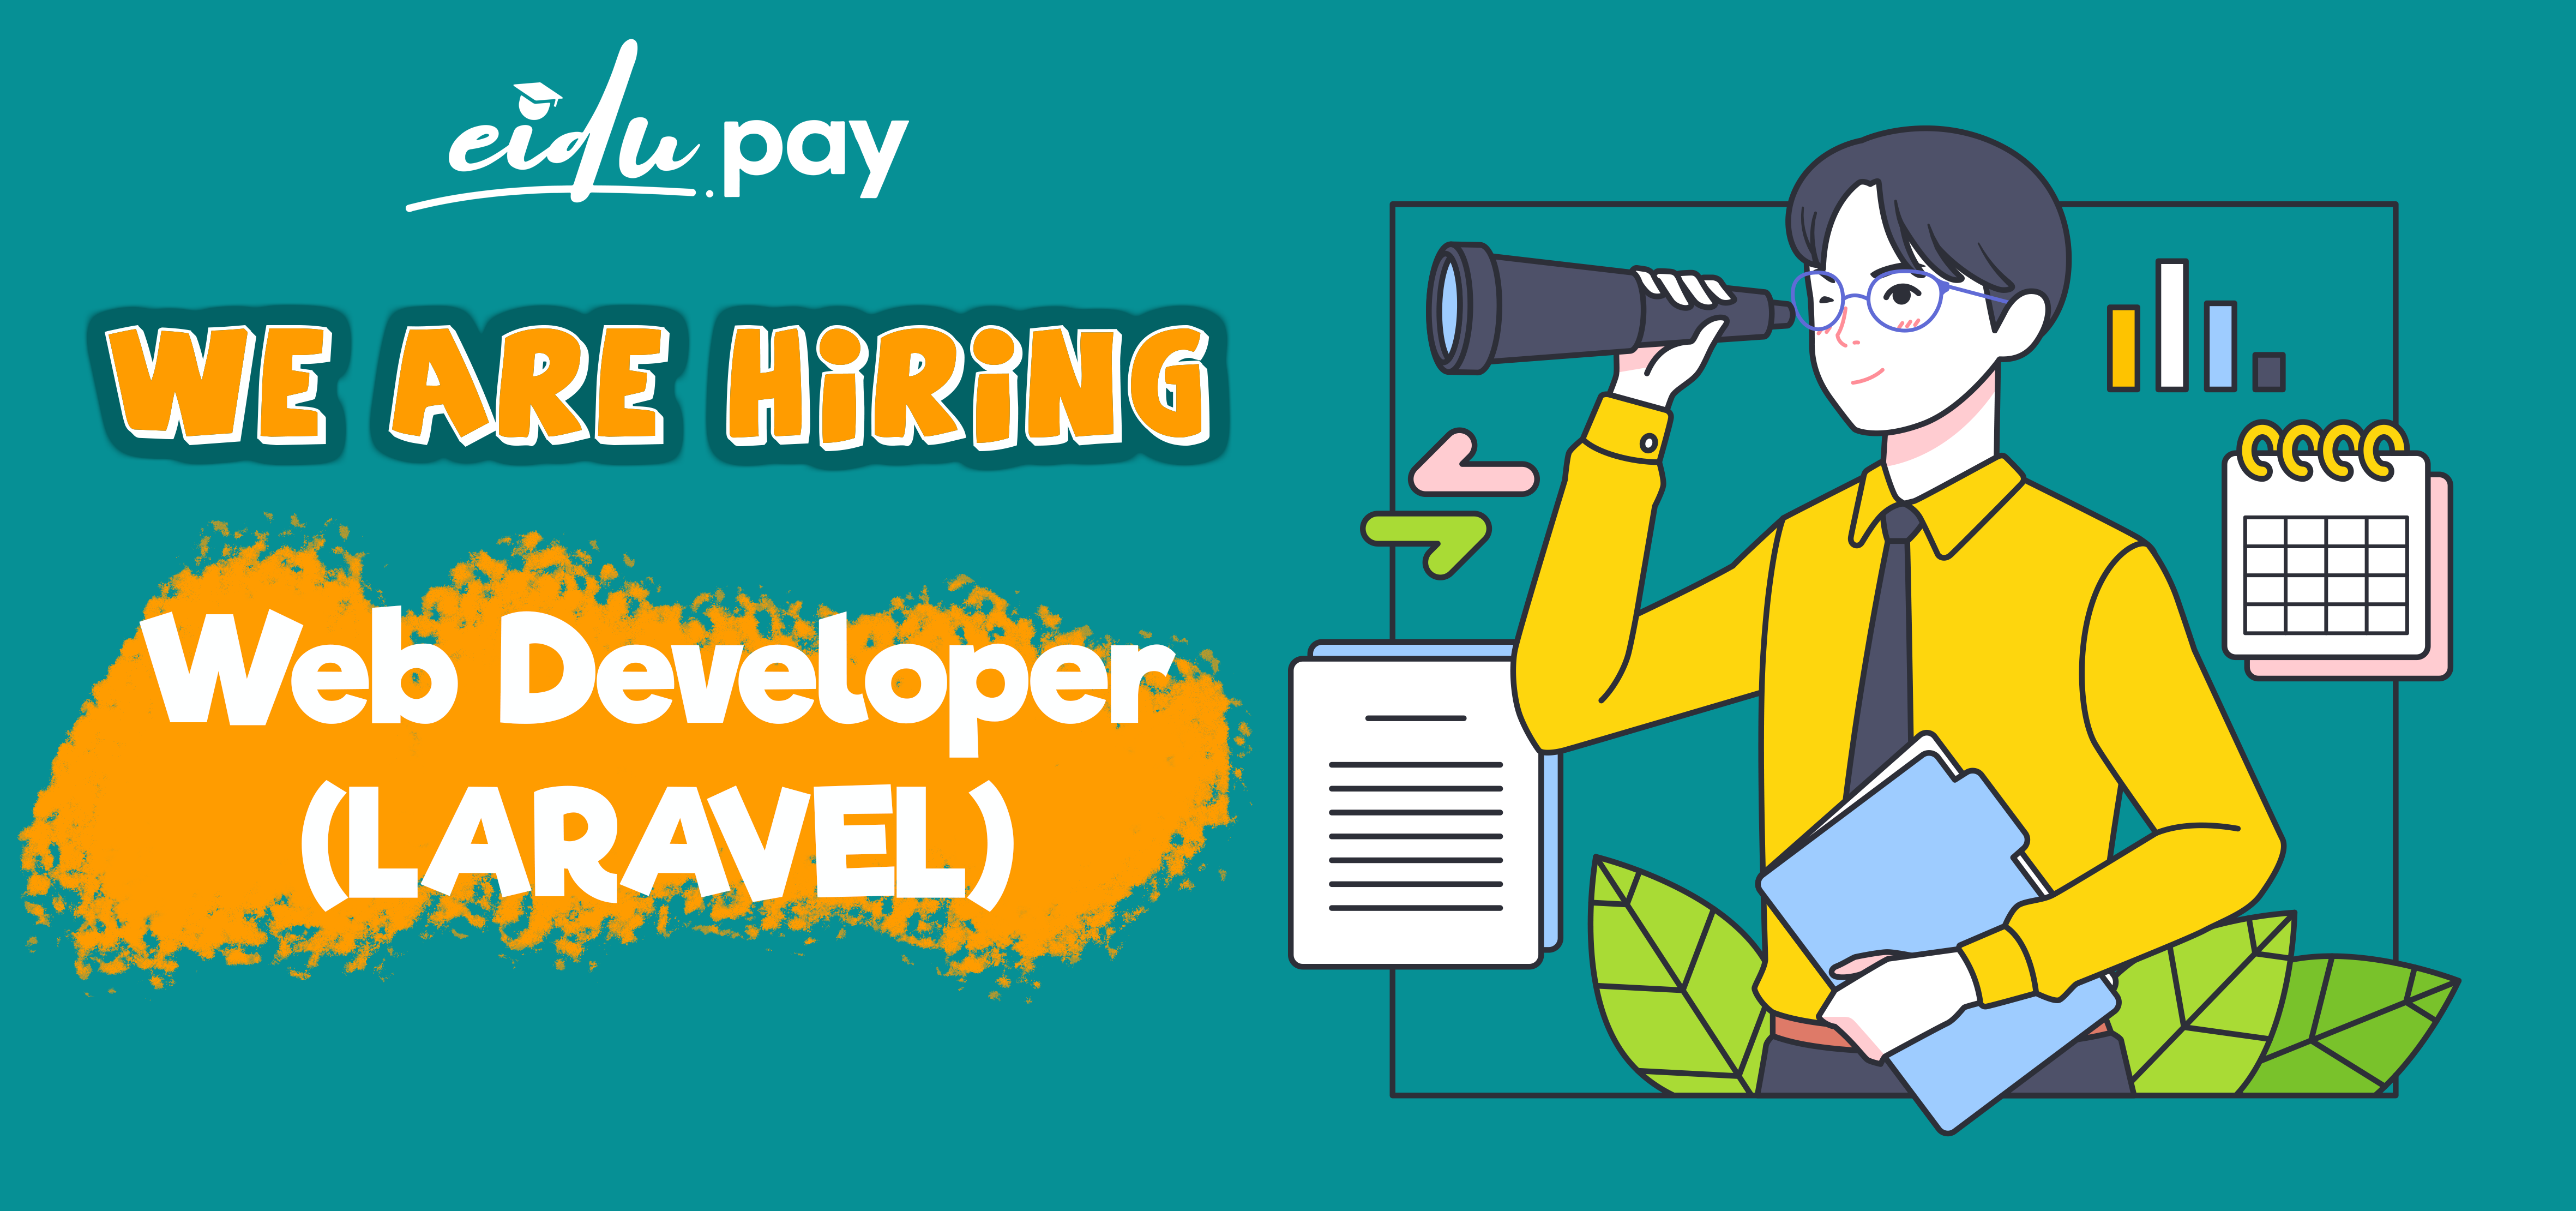 Lowongan Web Developer (LARAVEL)